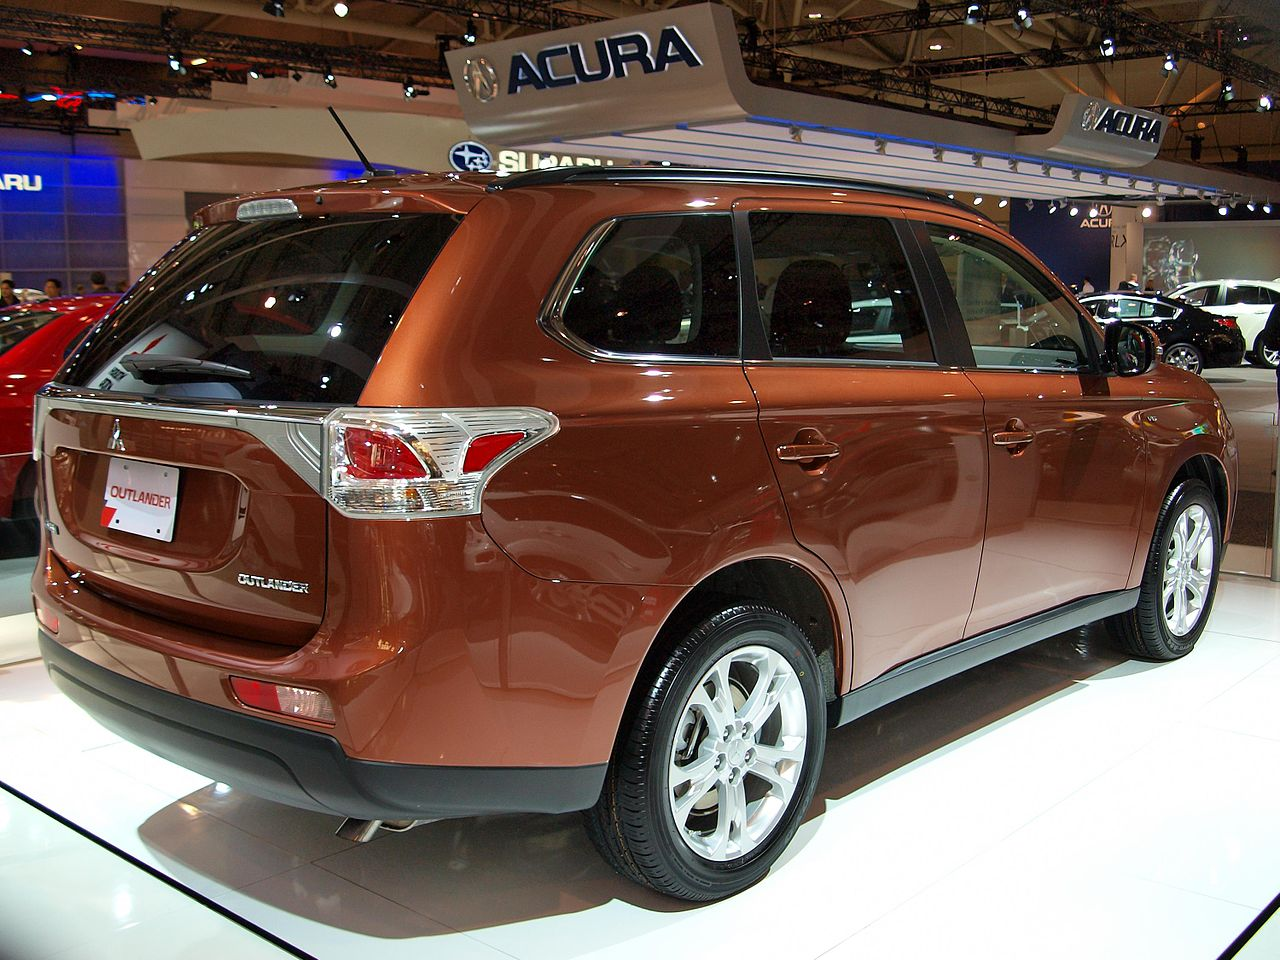 File:CIAS 2013 - 2014 Mitsubishi Outlander (8488022592).jpg - Wikimedia Commons